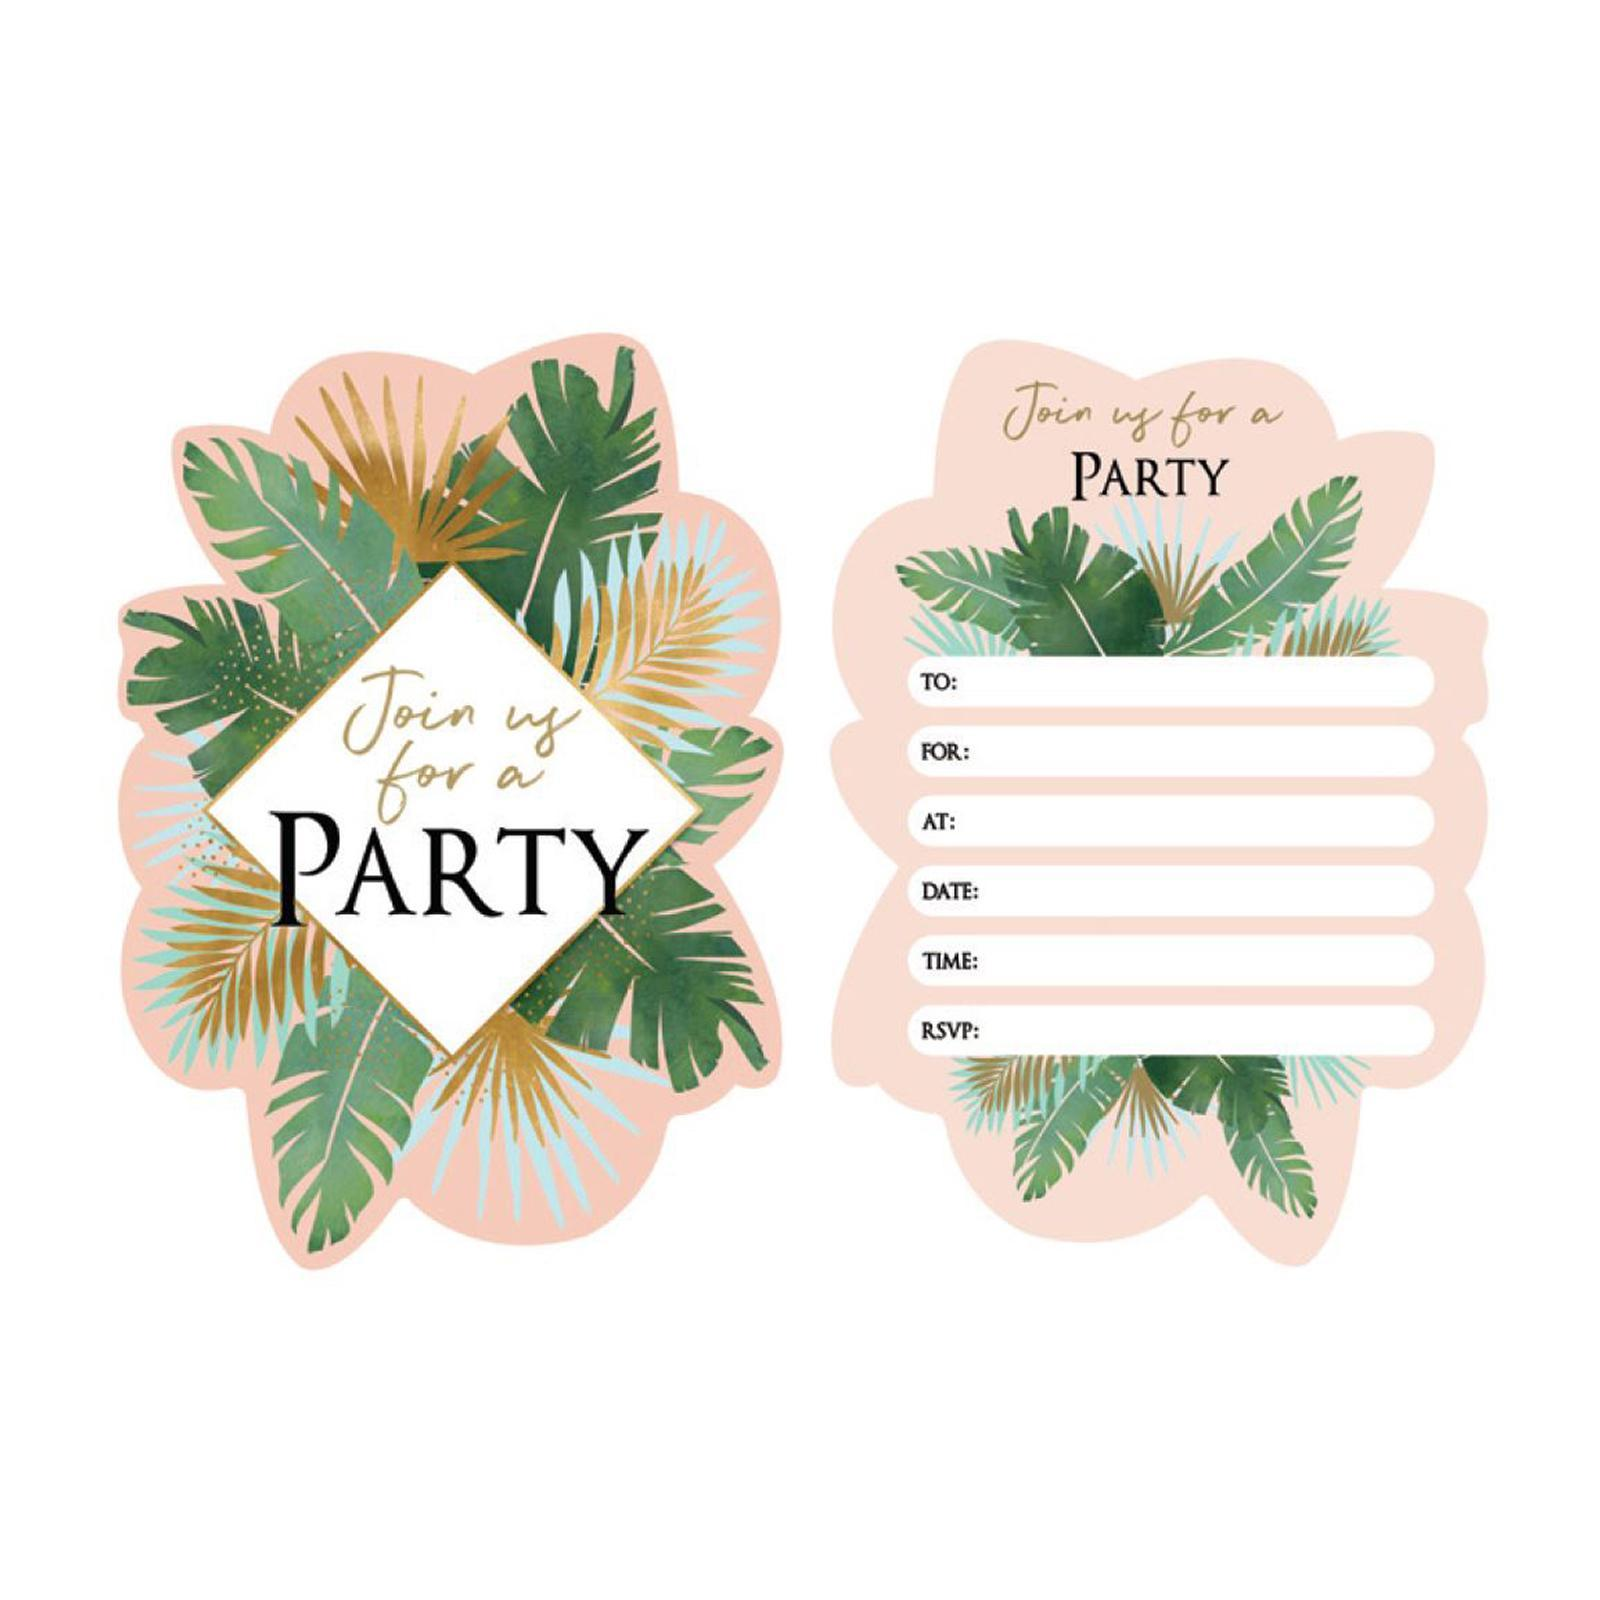 Artwrap Party Invitation - Tropical